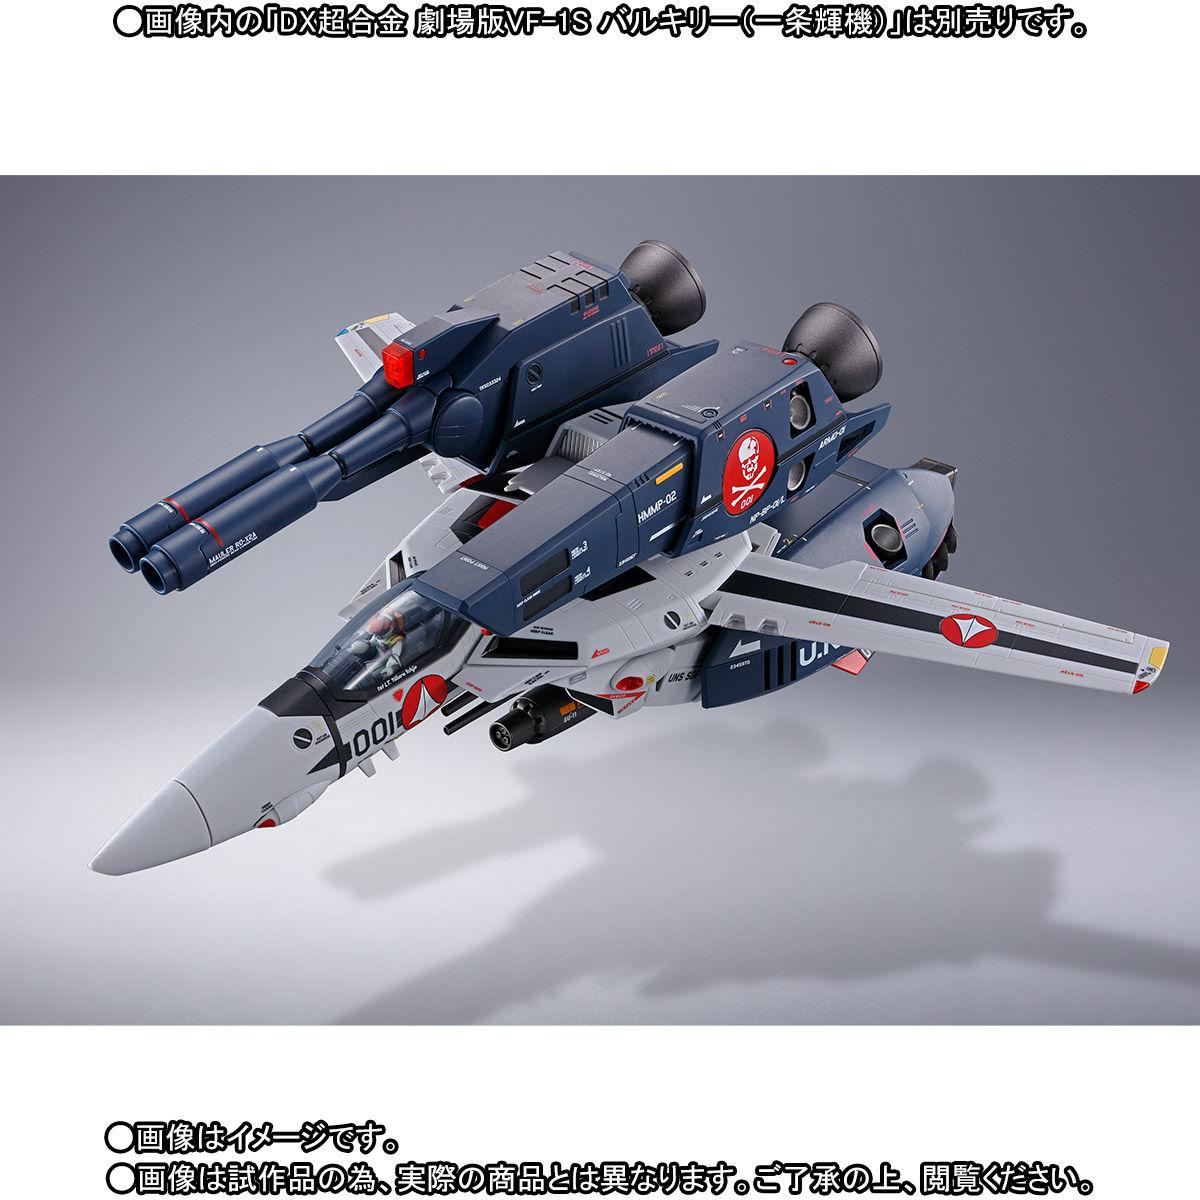 DX超合金『劇場版VF-1対応ストライク/スーパーパーツセット』拡張パーツ-003